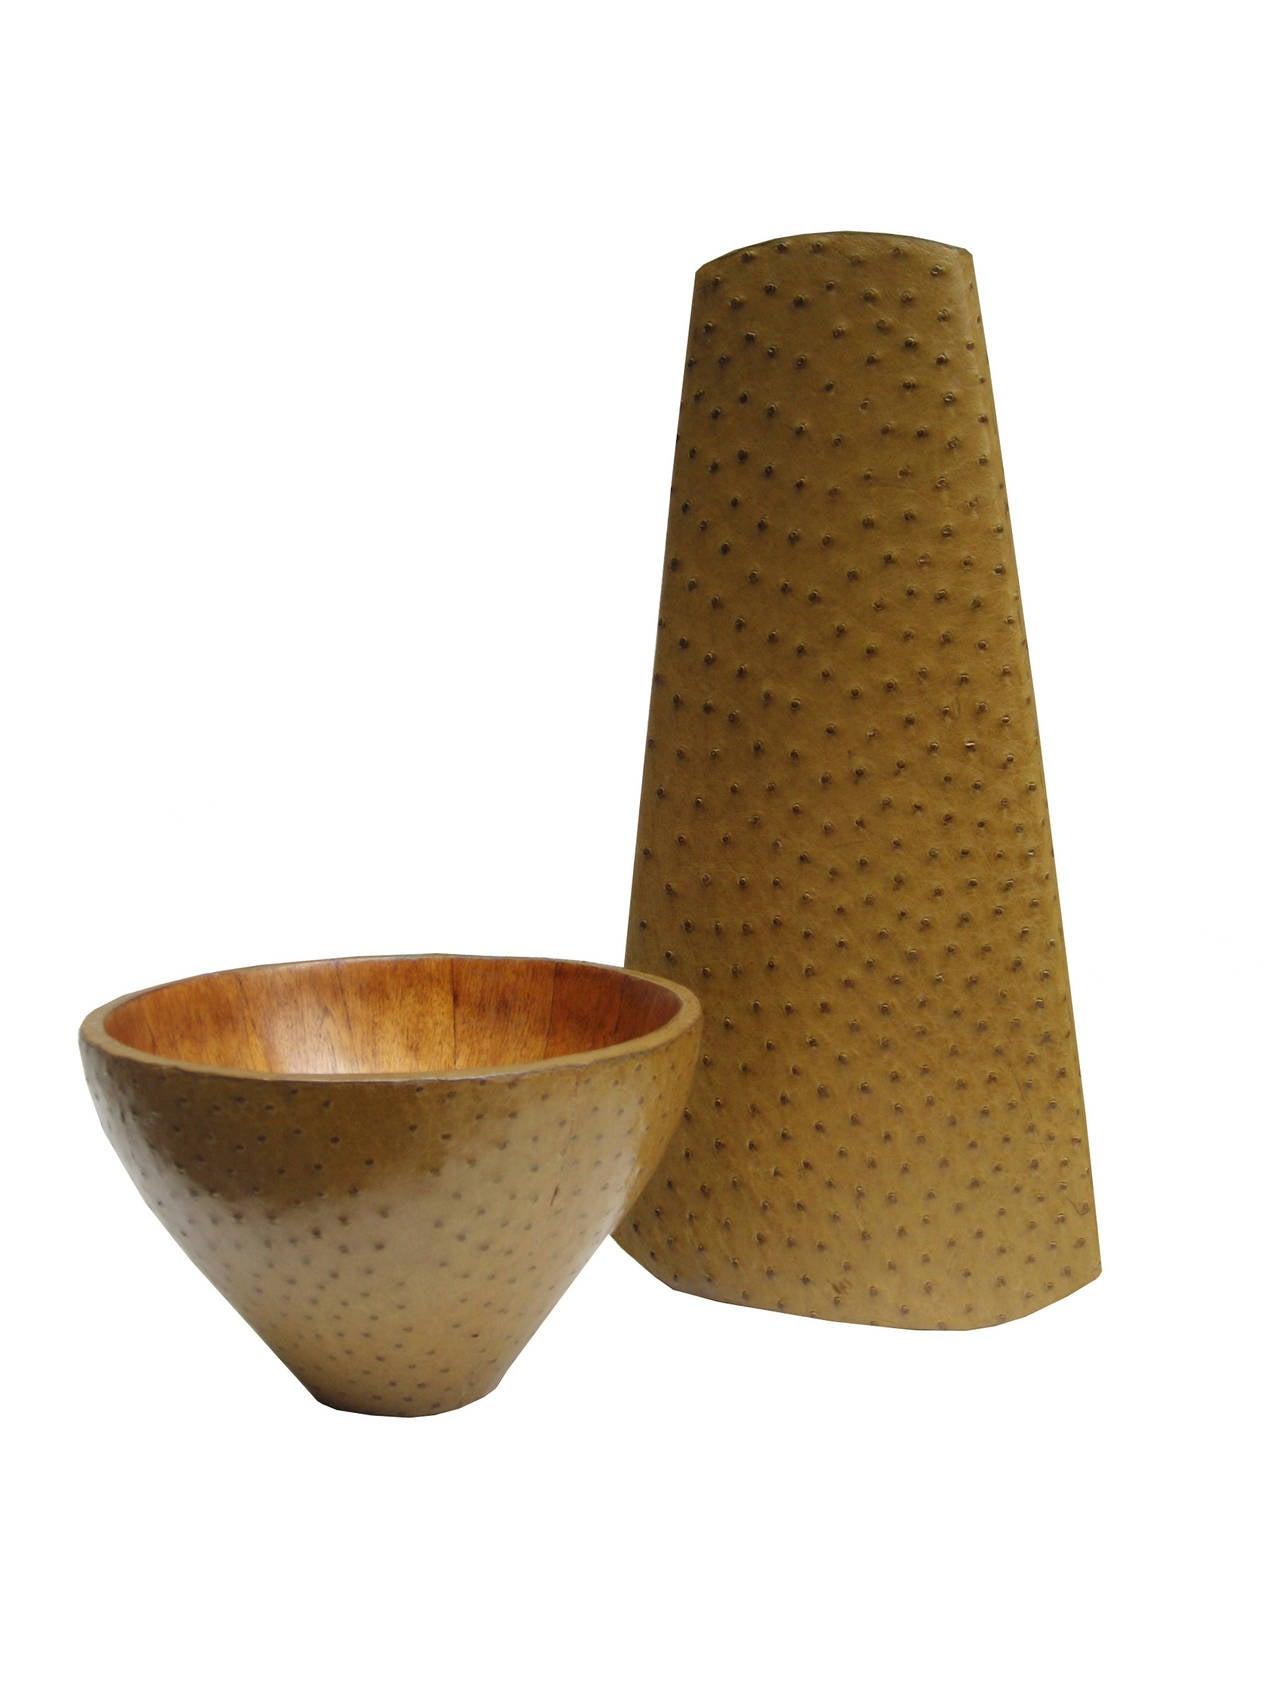 A R&Y Augousti designed vase and bowl set.